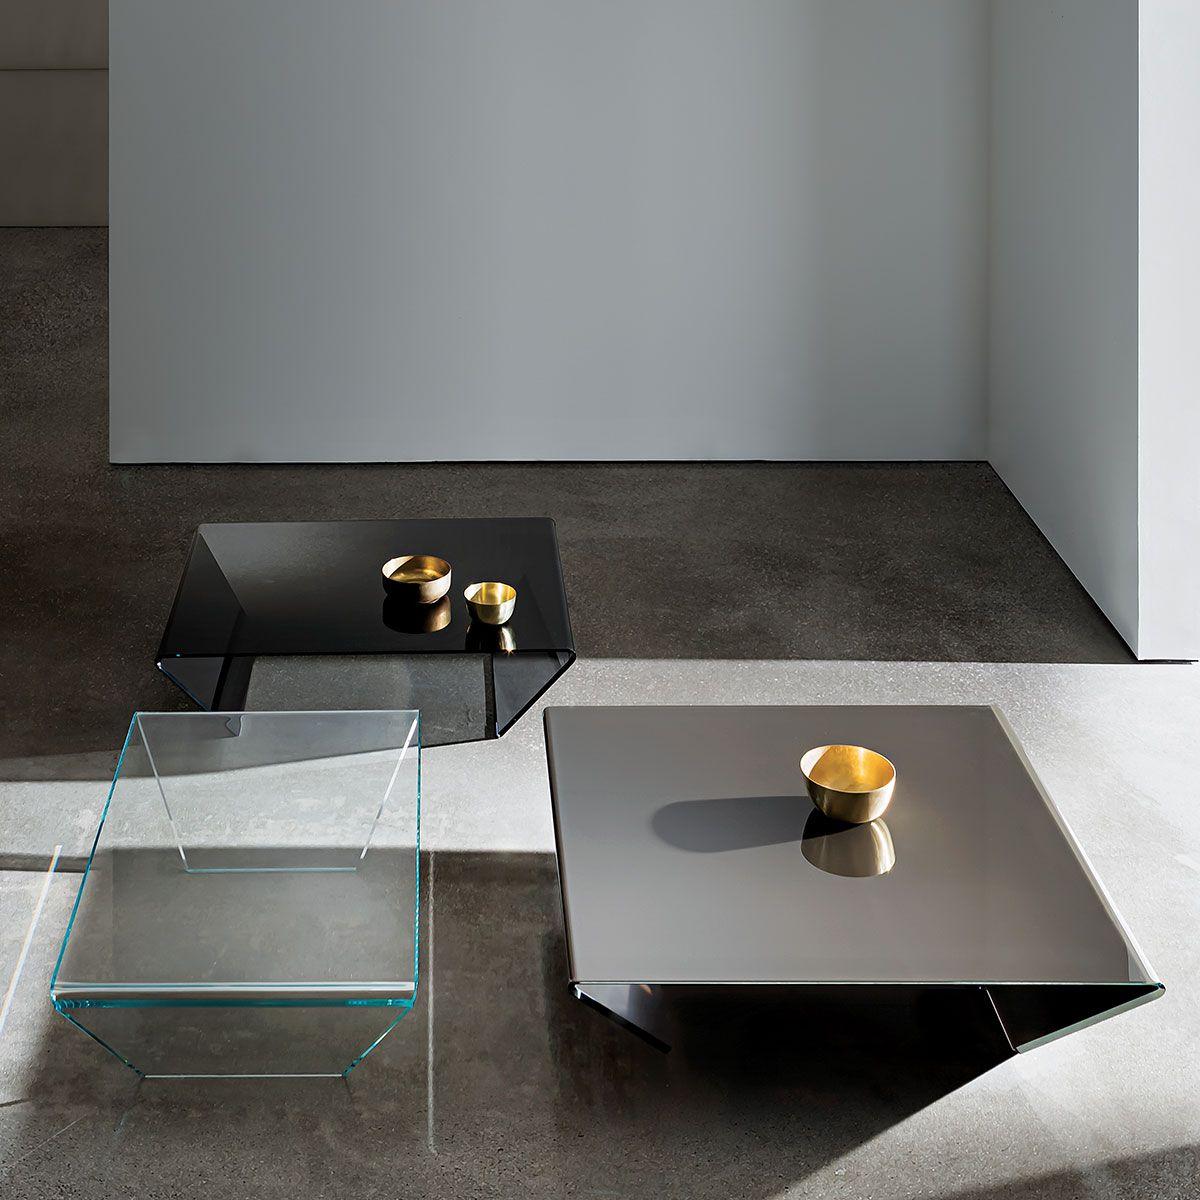 Rubino Curved Glass Coffee Table Klarity Glass Furniture Coffee Table Glass Coffee Table Glass Furniture [ 1200 x 1200 Pixel ]